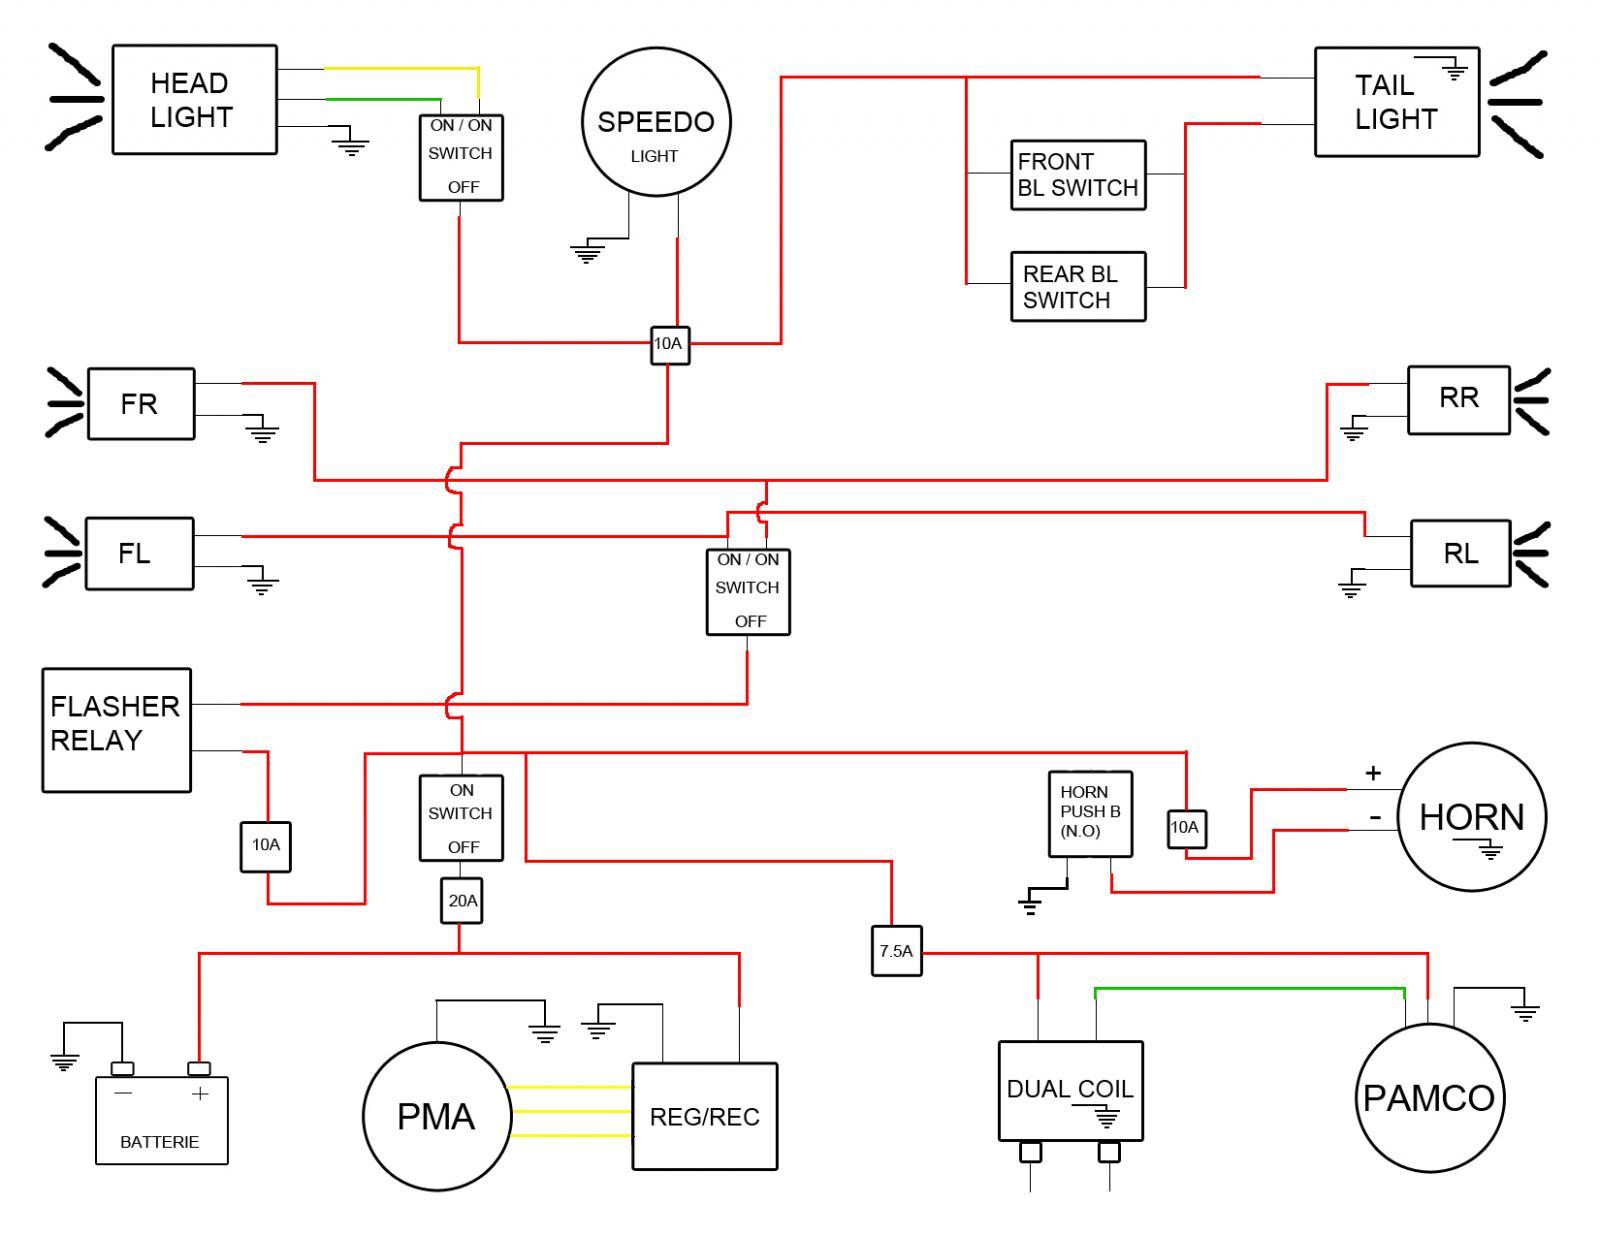 Xs650 simplified wiring diagram yamaha xs650 forum xs650 schematicsg pooptronica